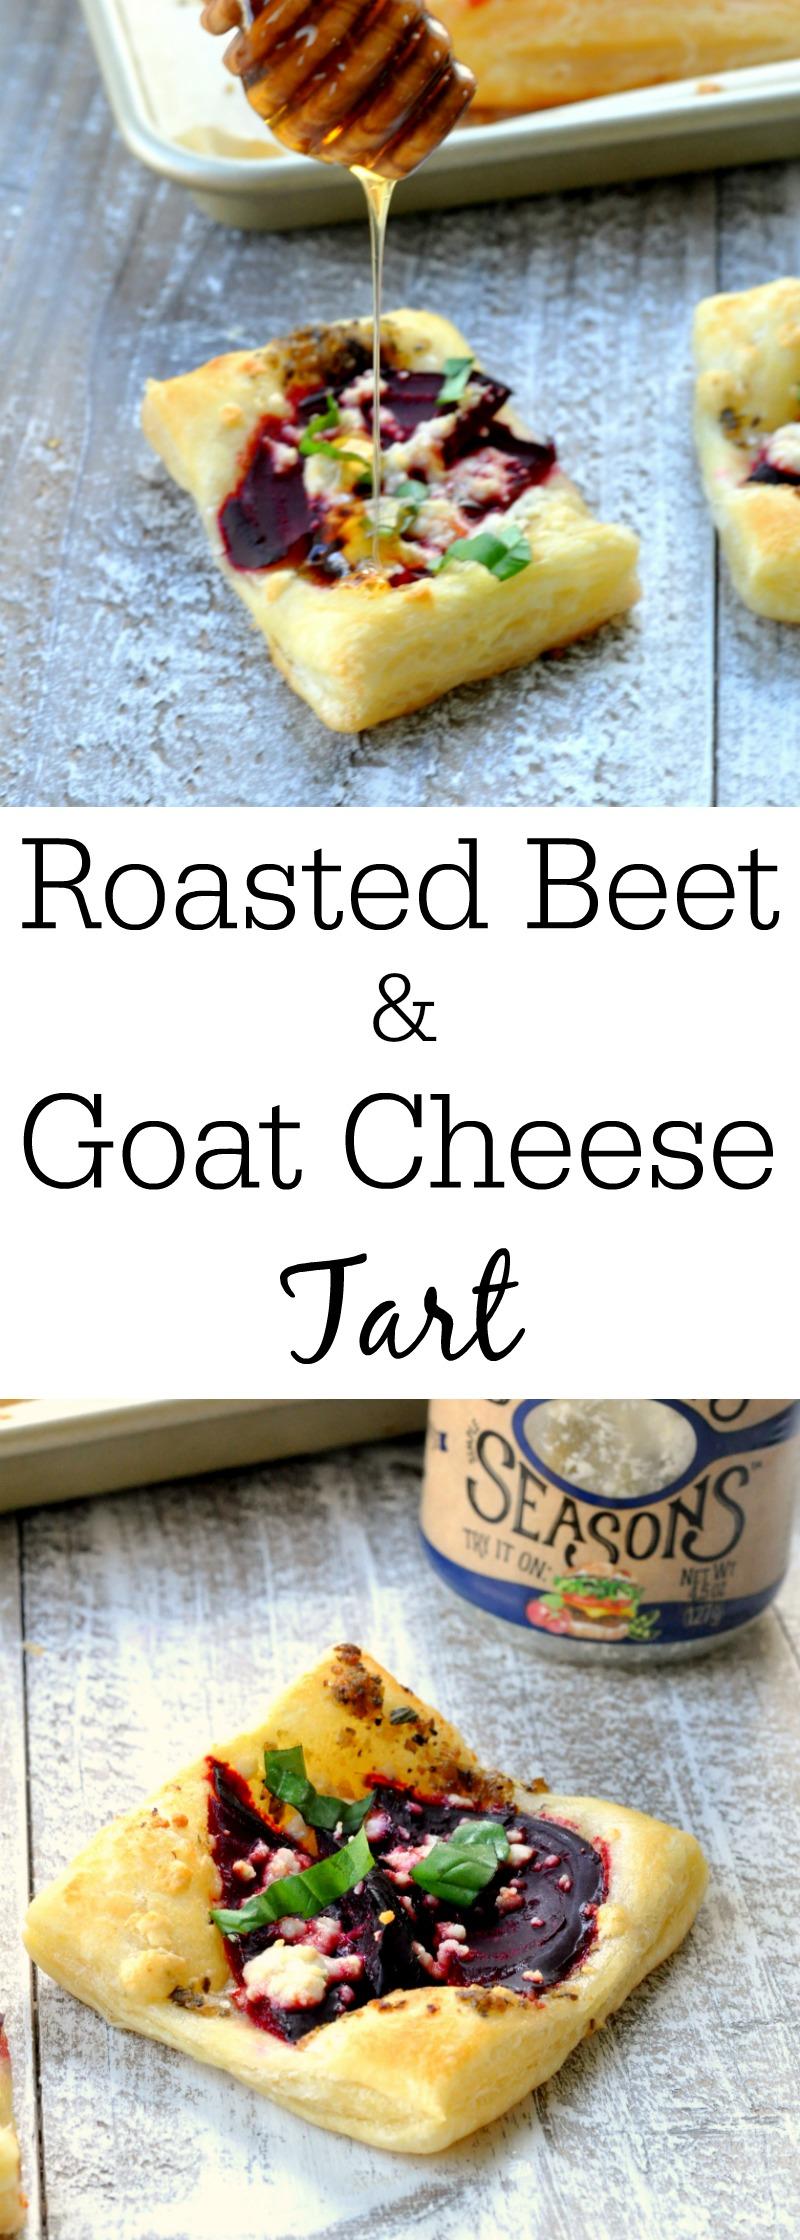 Roasted Beet and Blue Cheese Tart - My Suburban Kitchen